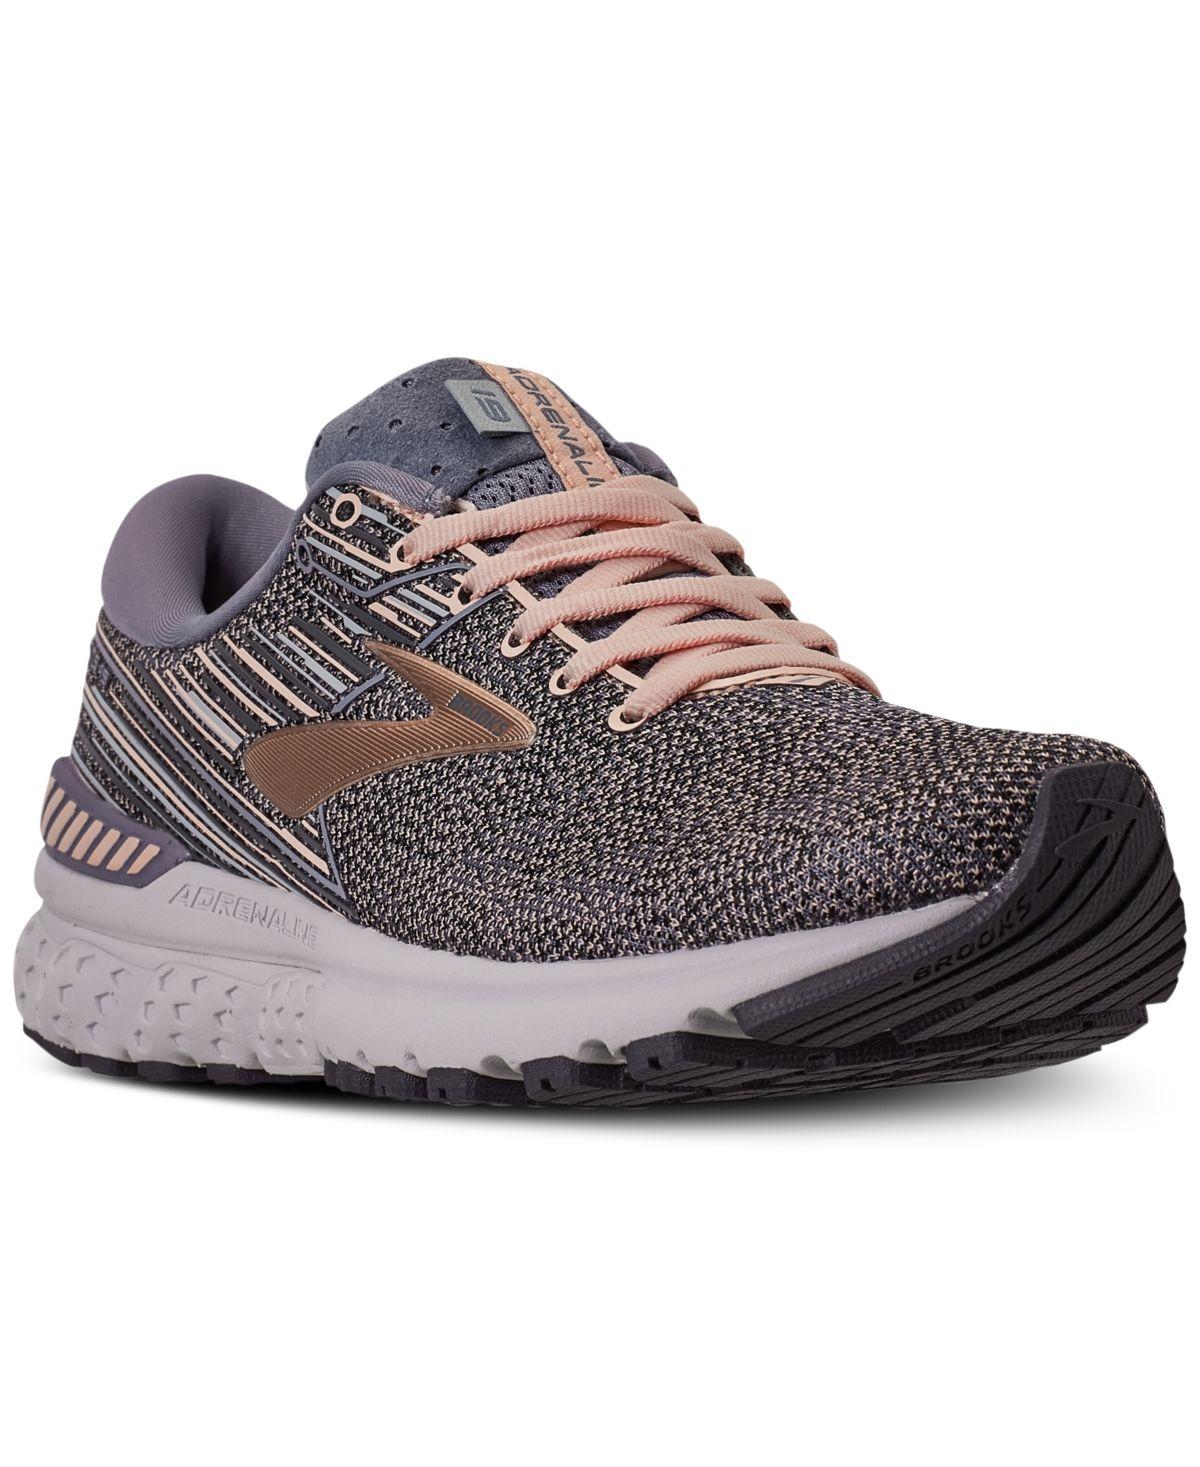 Brooks running shoes women, Brooks